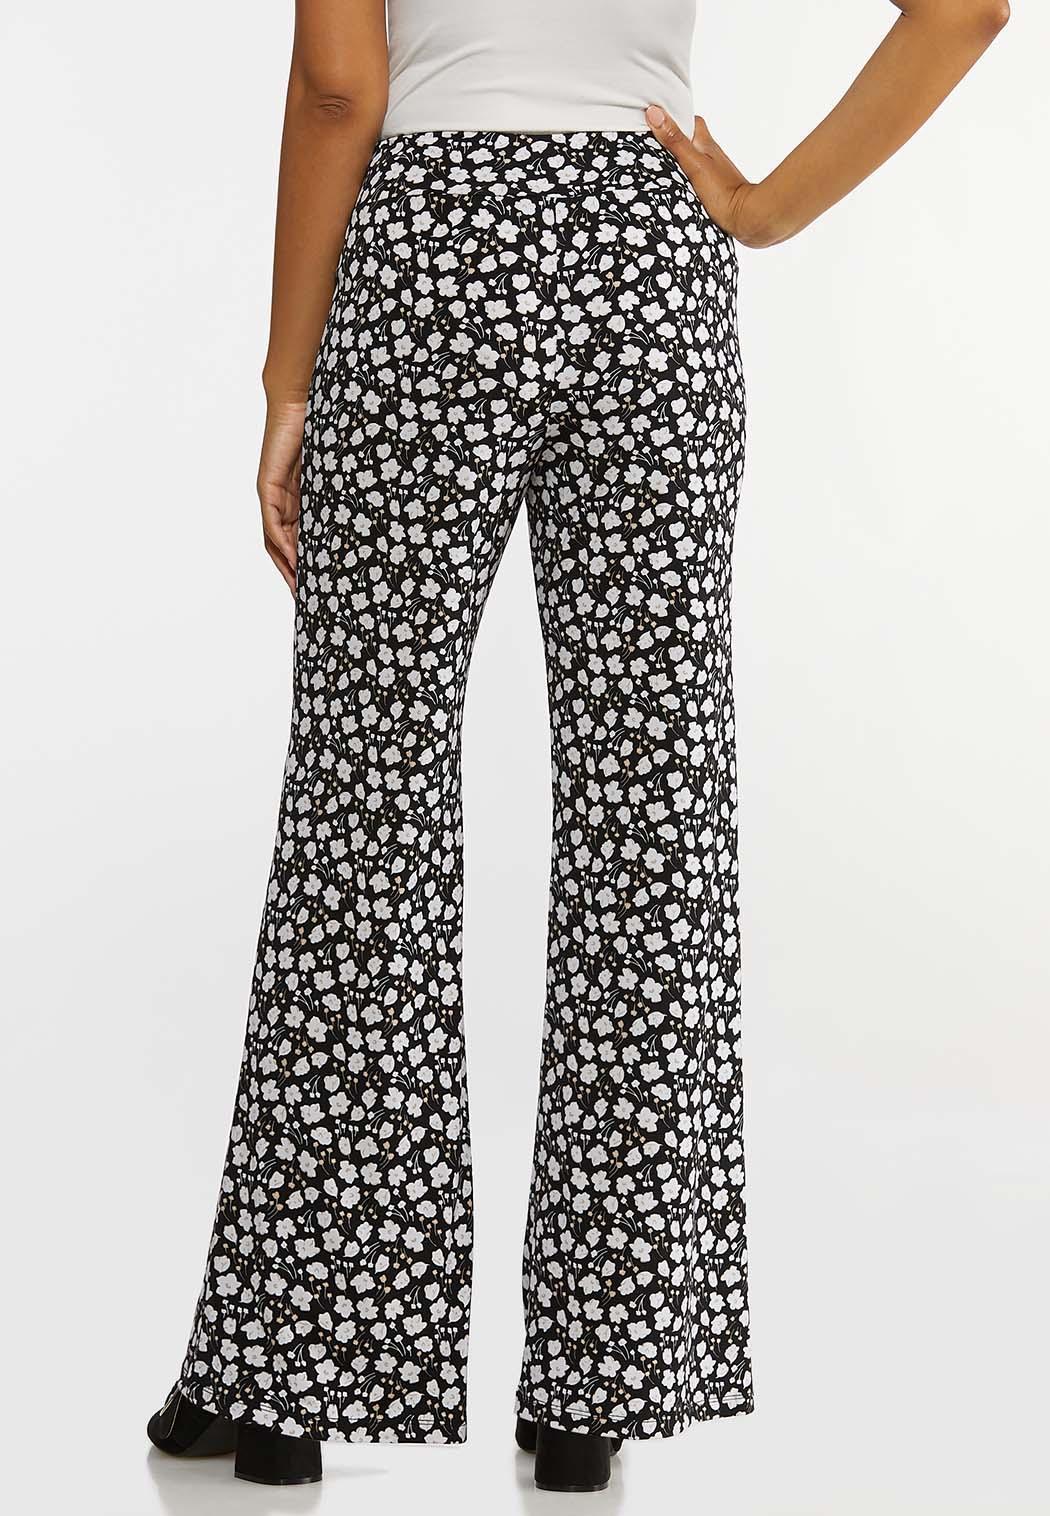 Petite Bitty Floral Tie Waist Pants (Item #44159758)